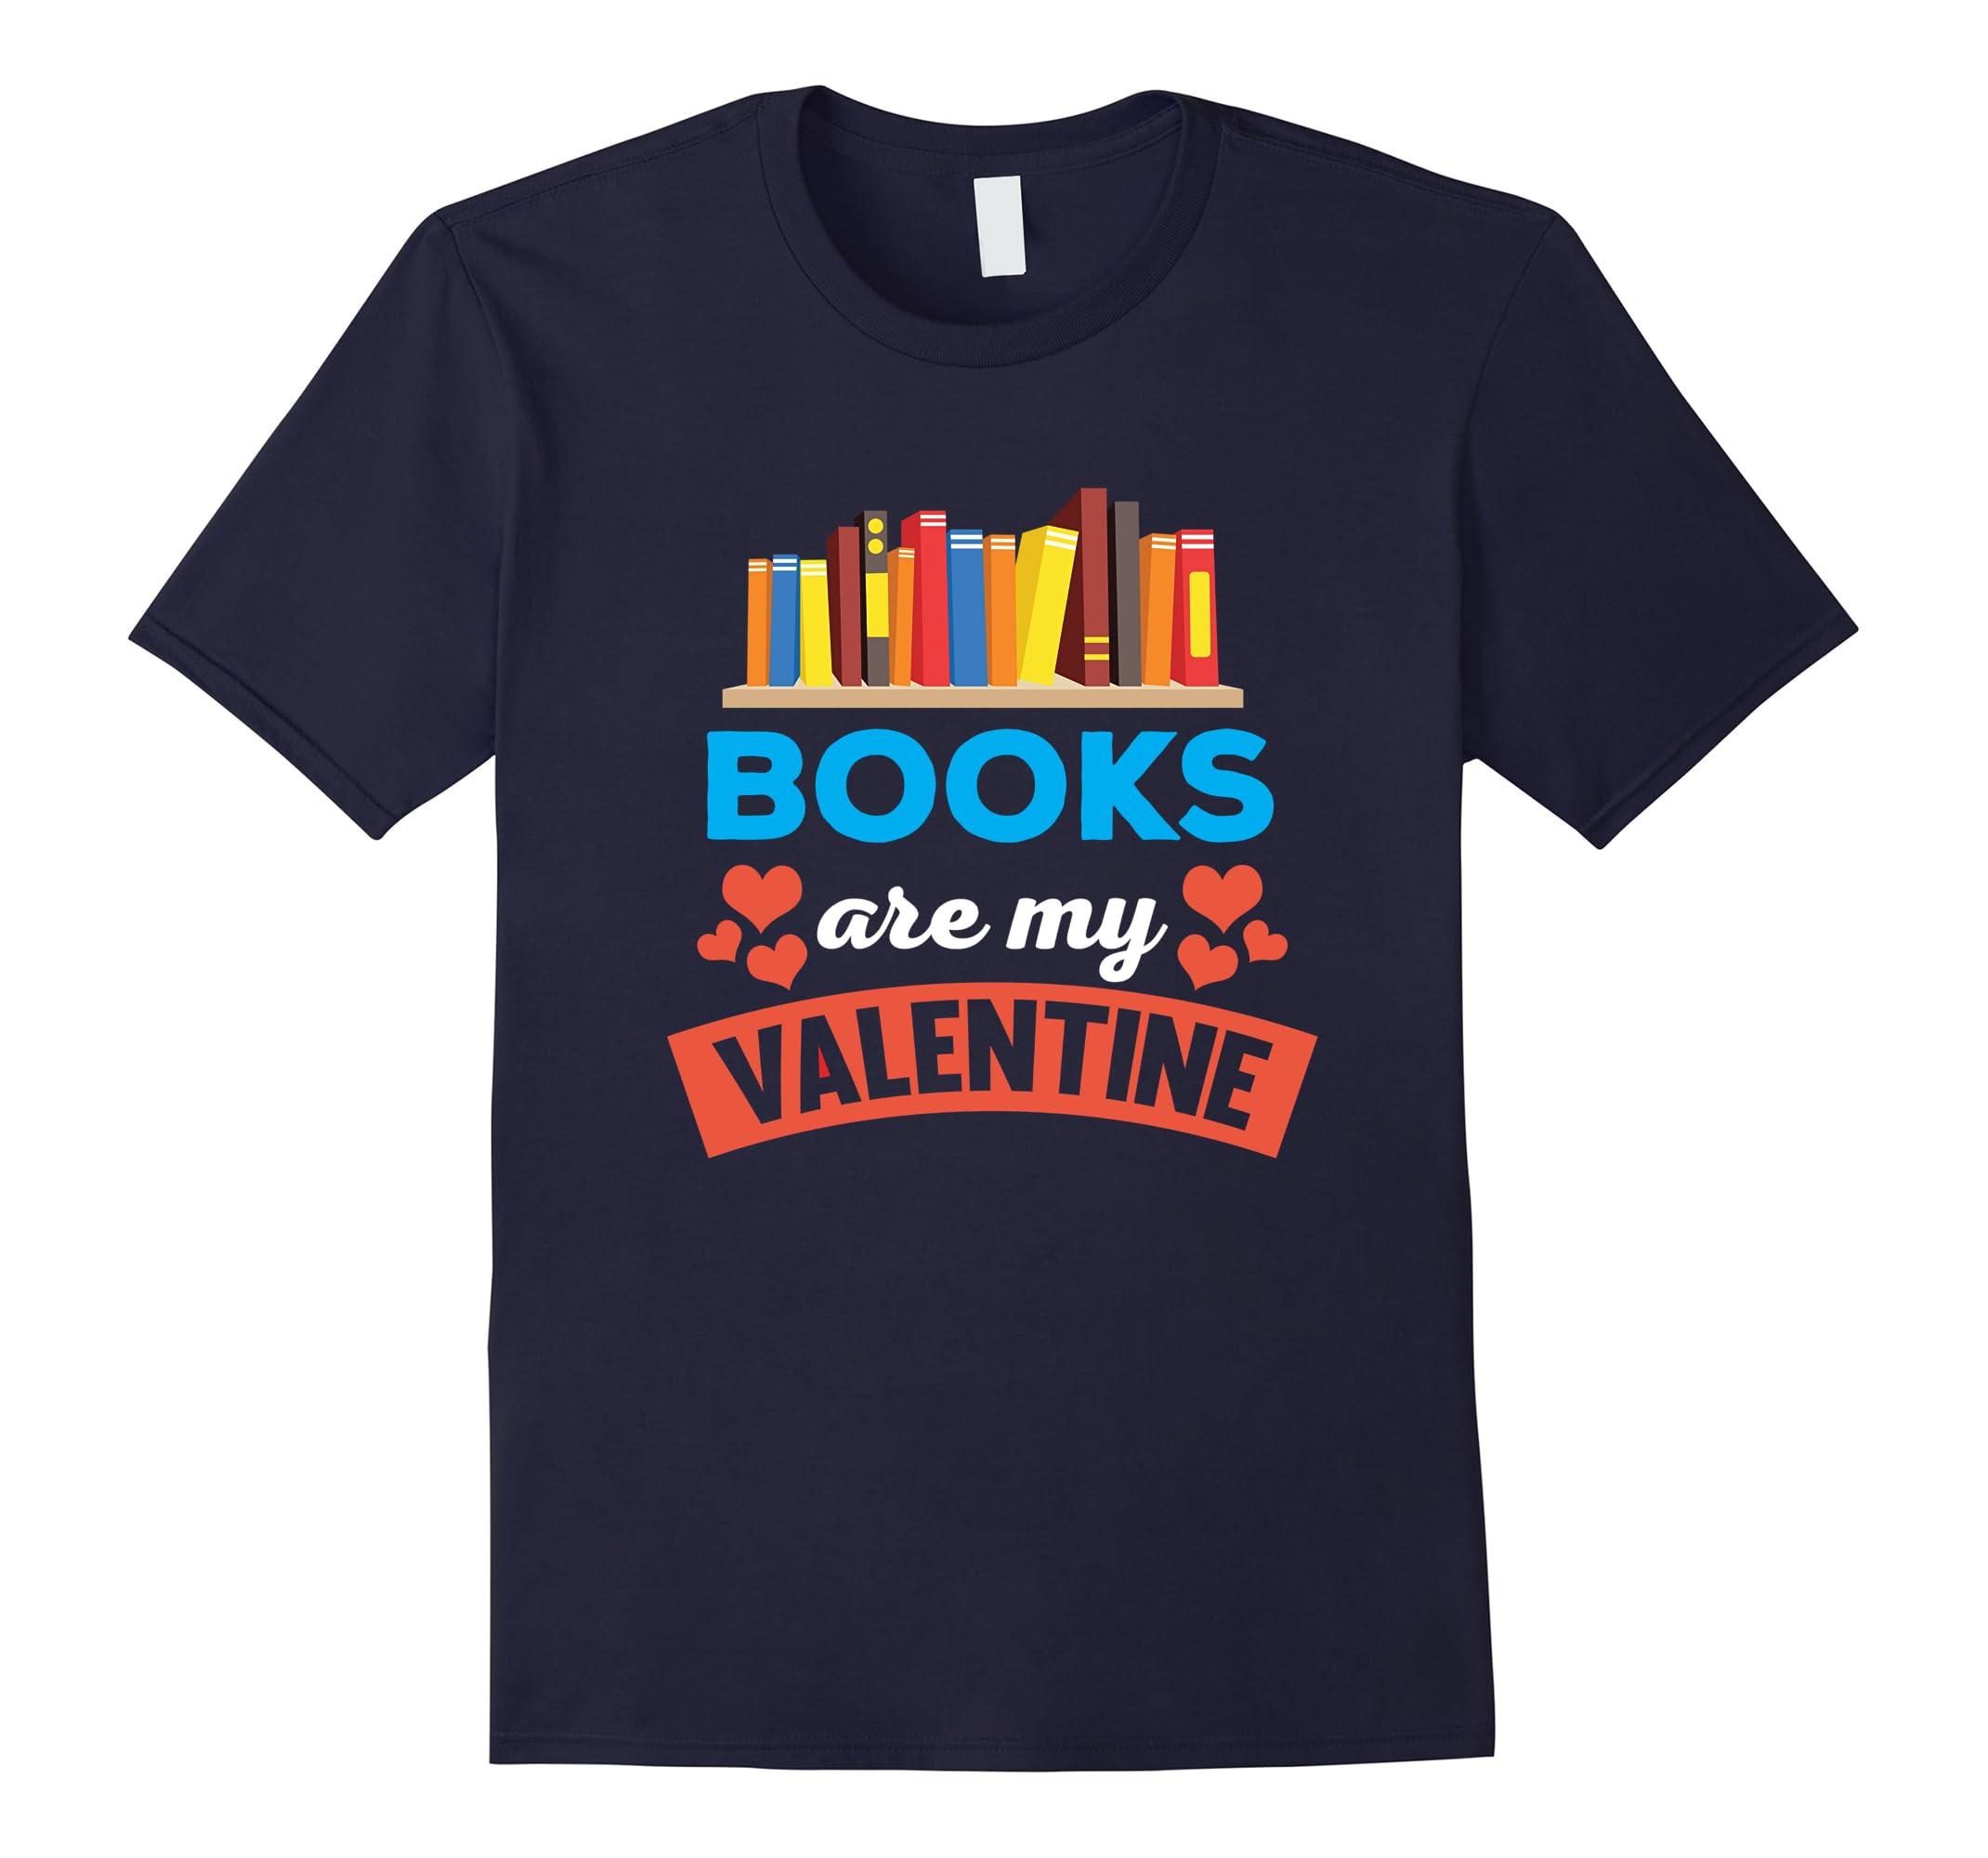 Books Are My Valentine-ah my shirt one gift